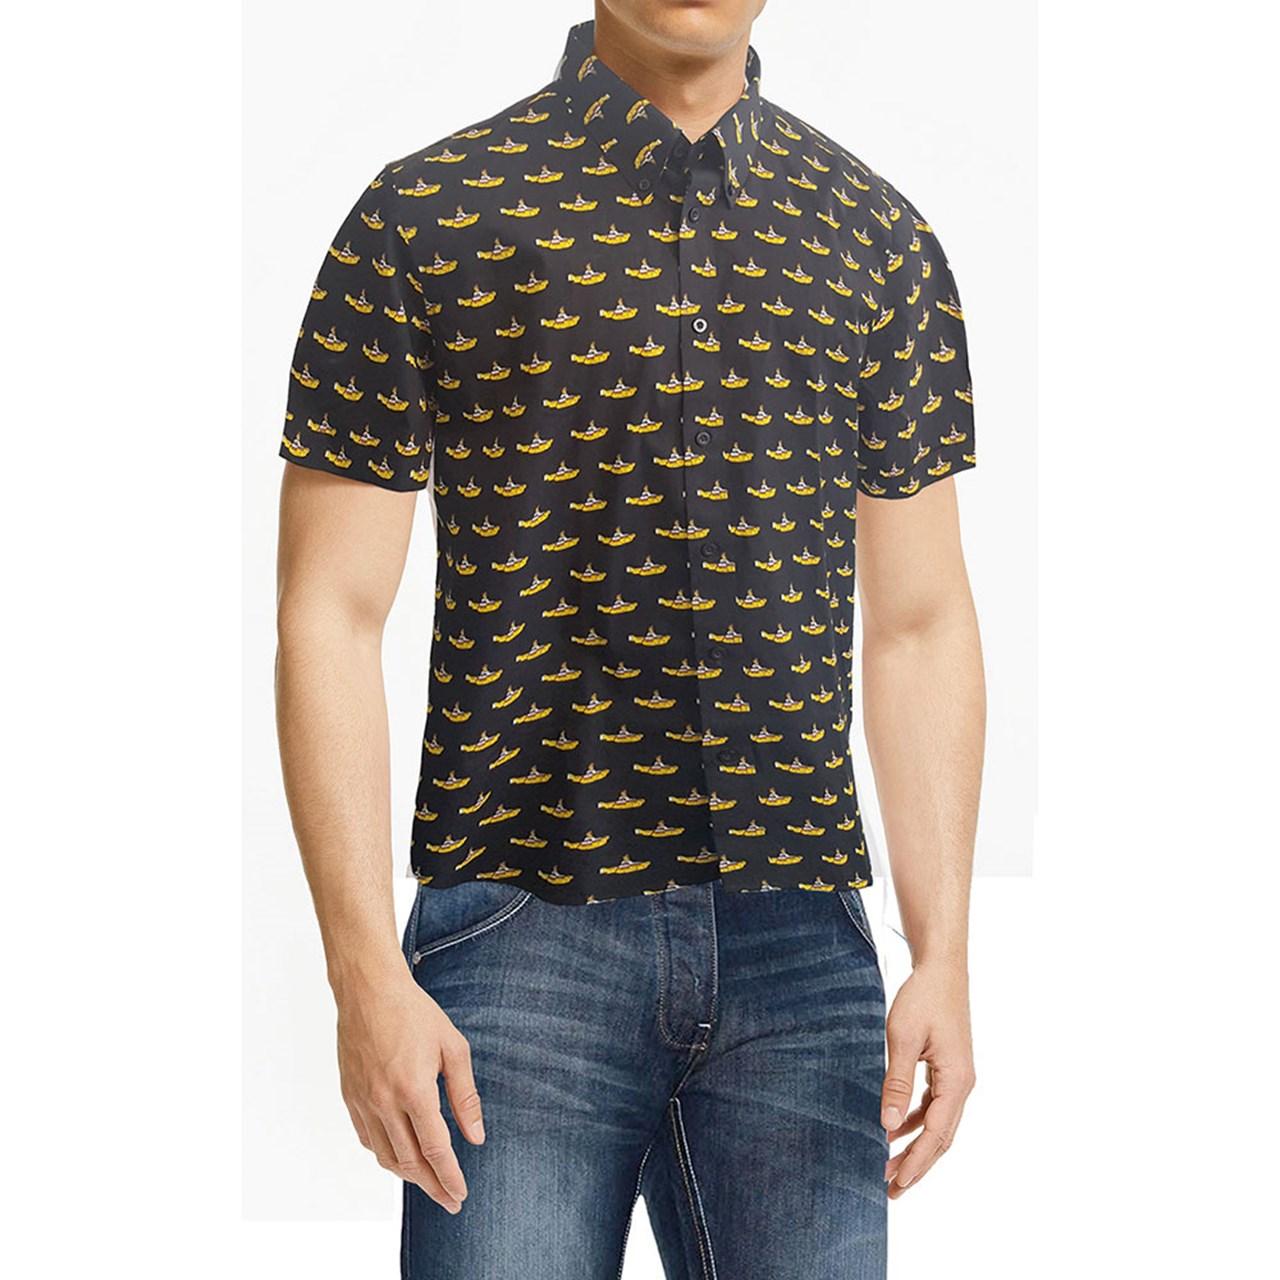 Beatles: Yellow Submarine Casual Shirt (Extra Large) - 1